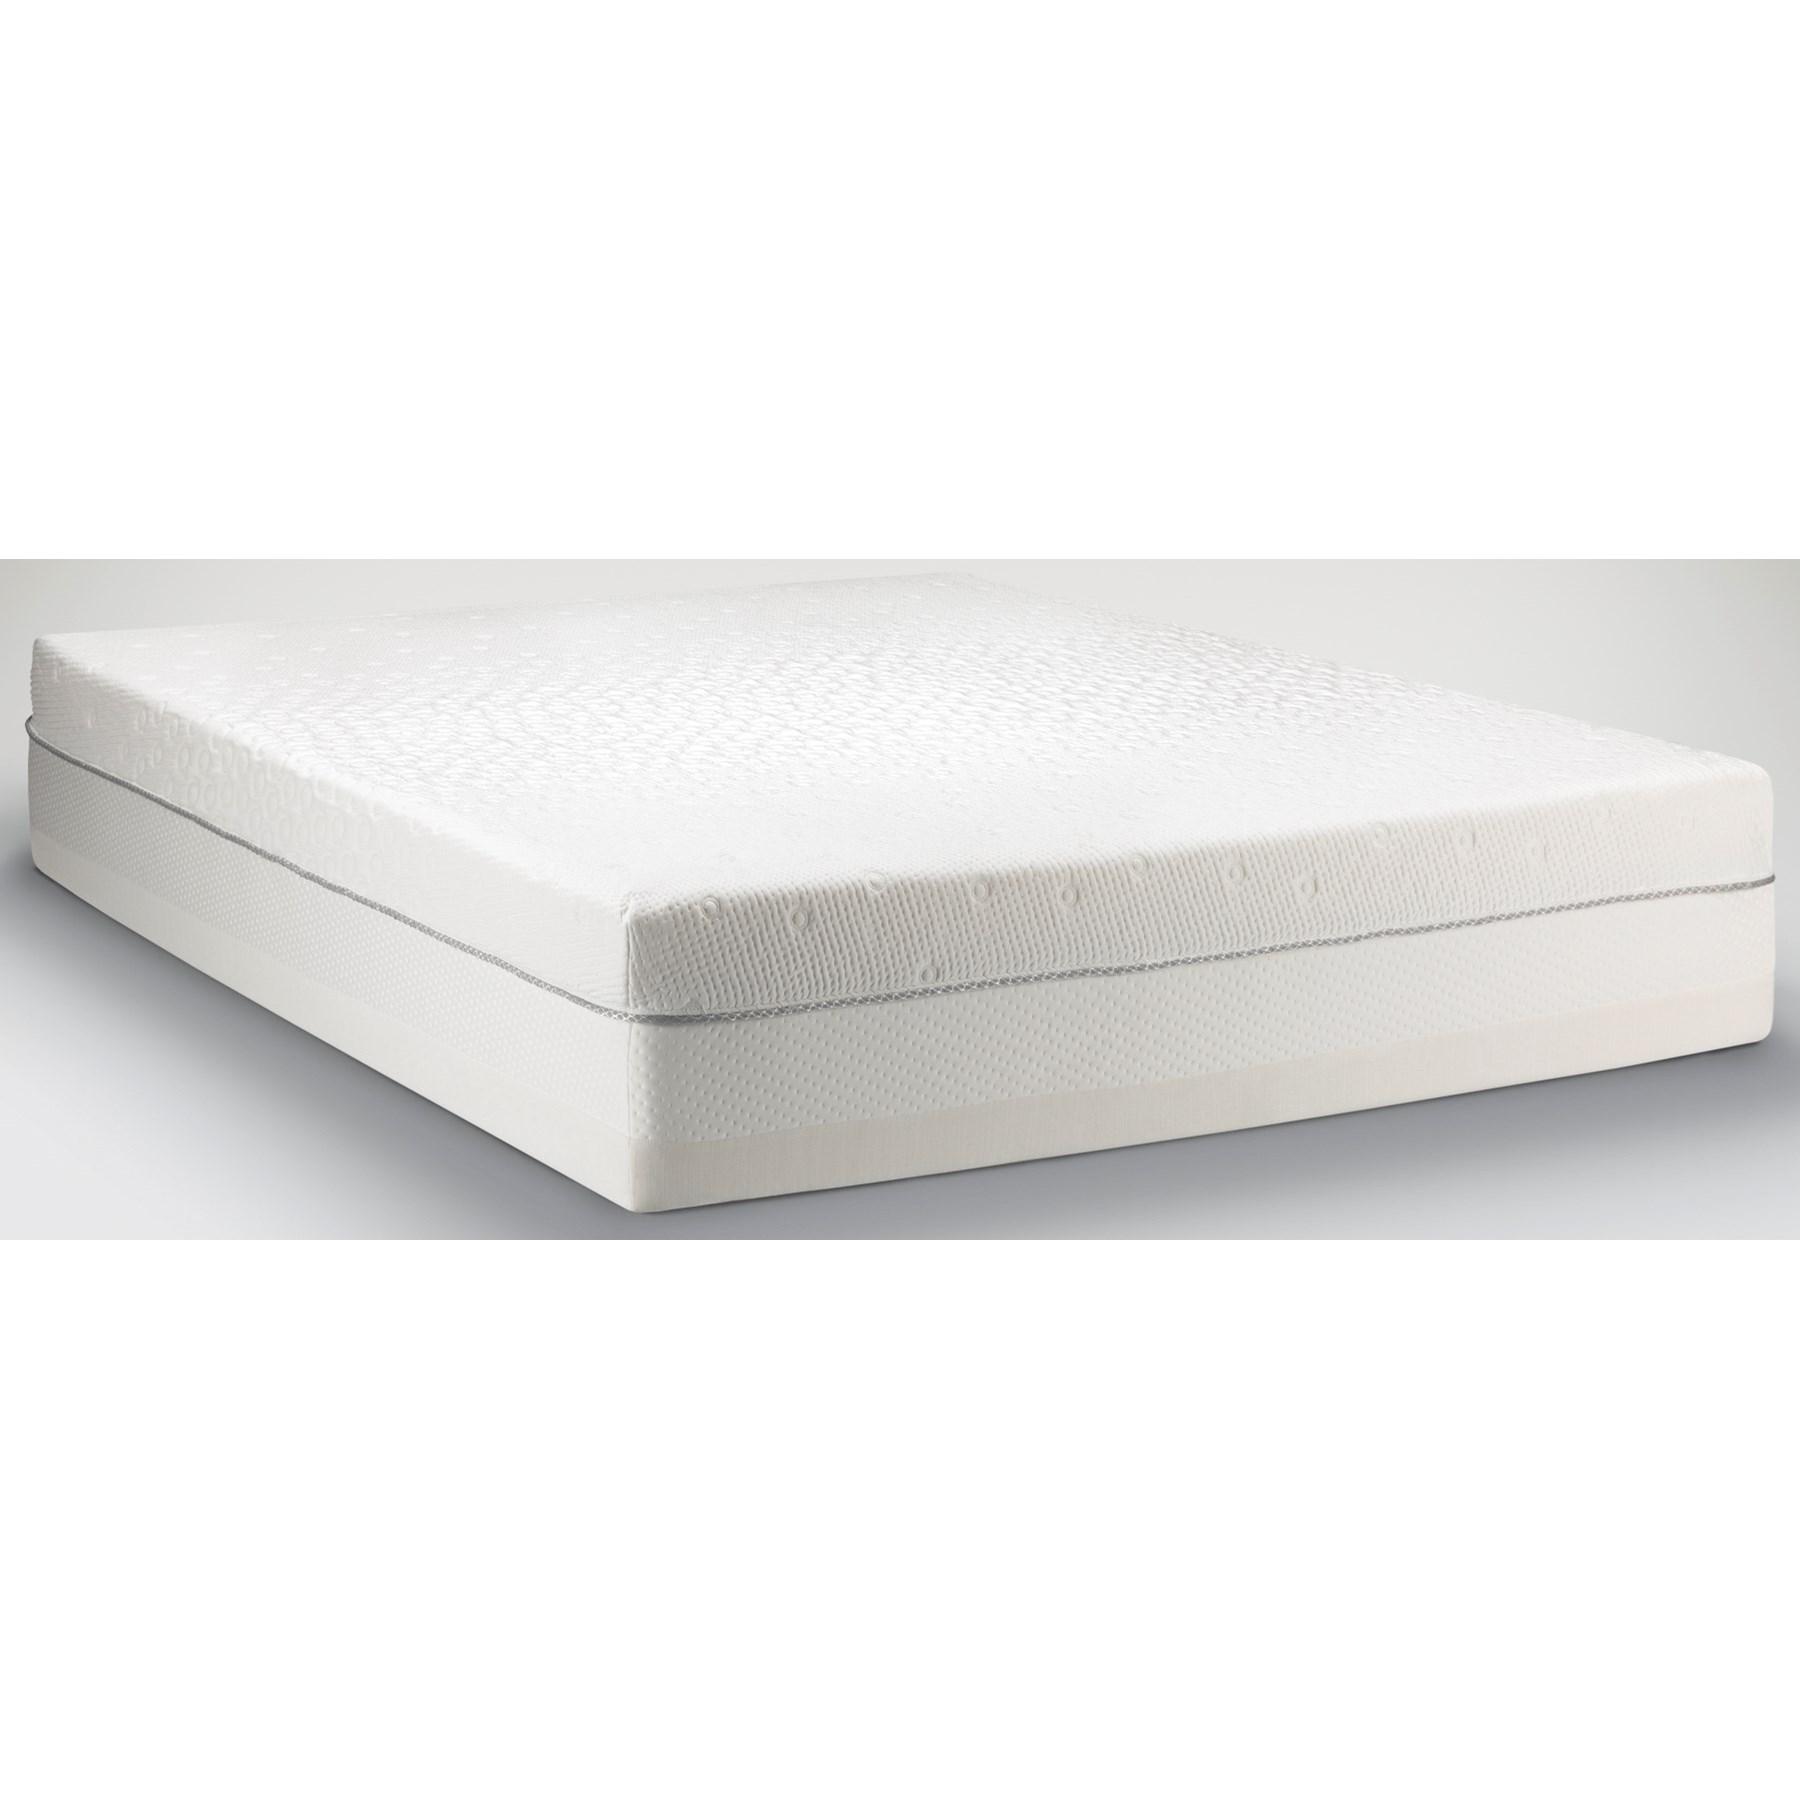 Tempur-Pedic®  TEMPUR-Choice™  Supreme Queen Firm to Medium Soft Matt, Adj Set - Item Number: 10111150+25287150